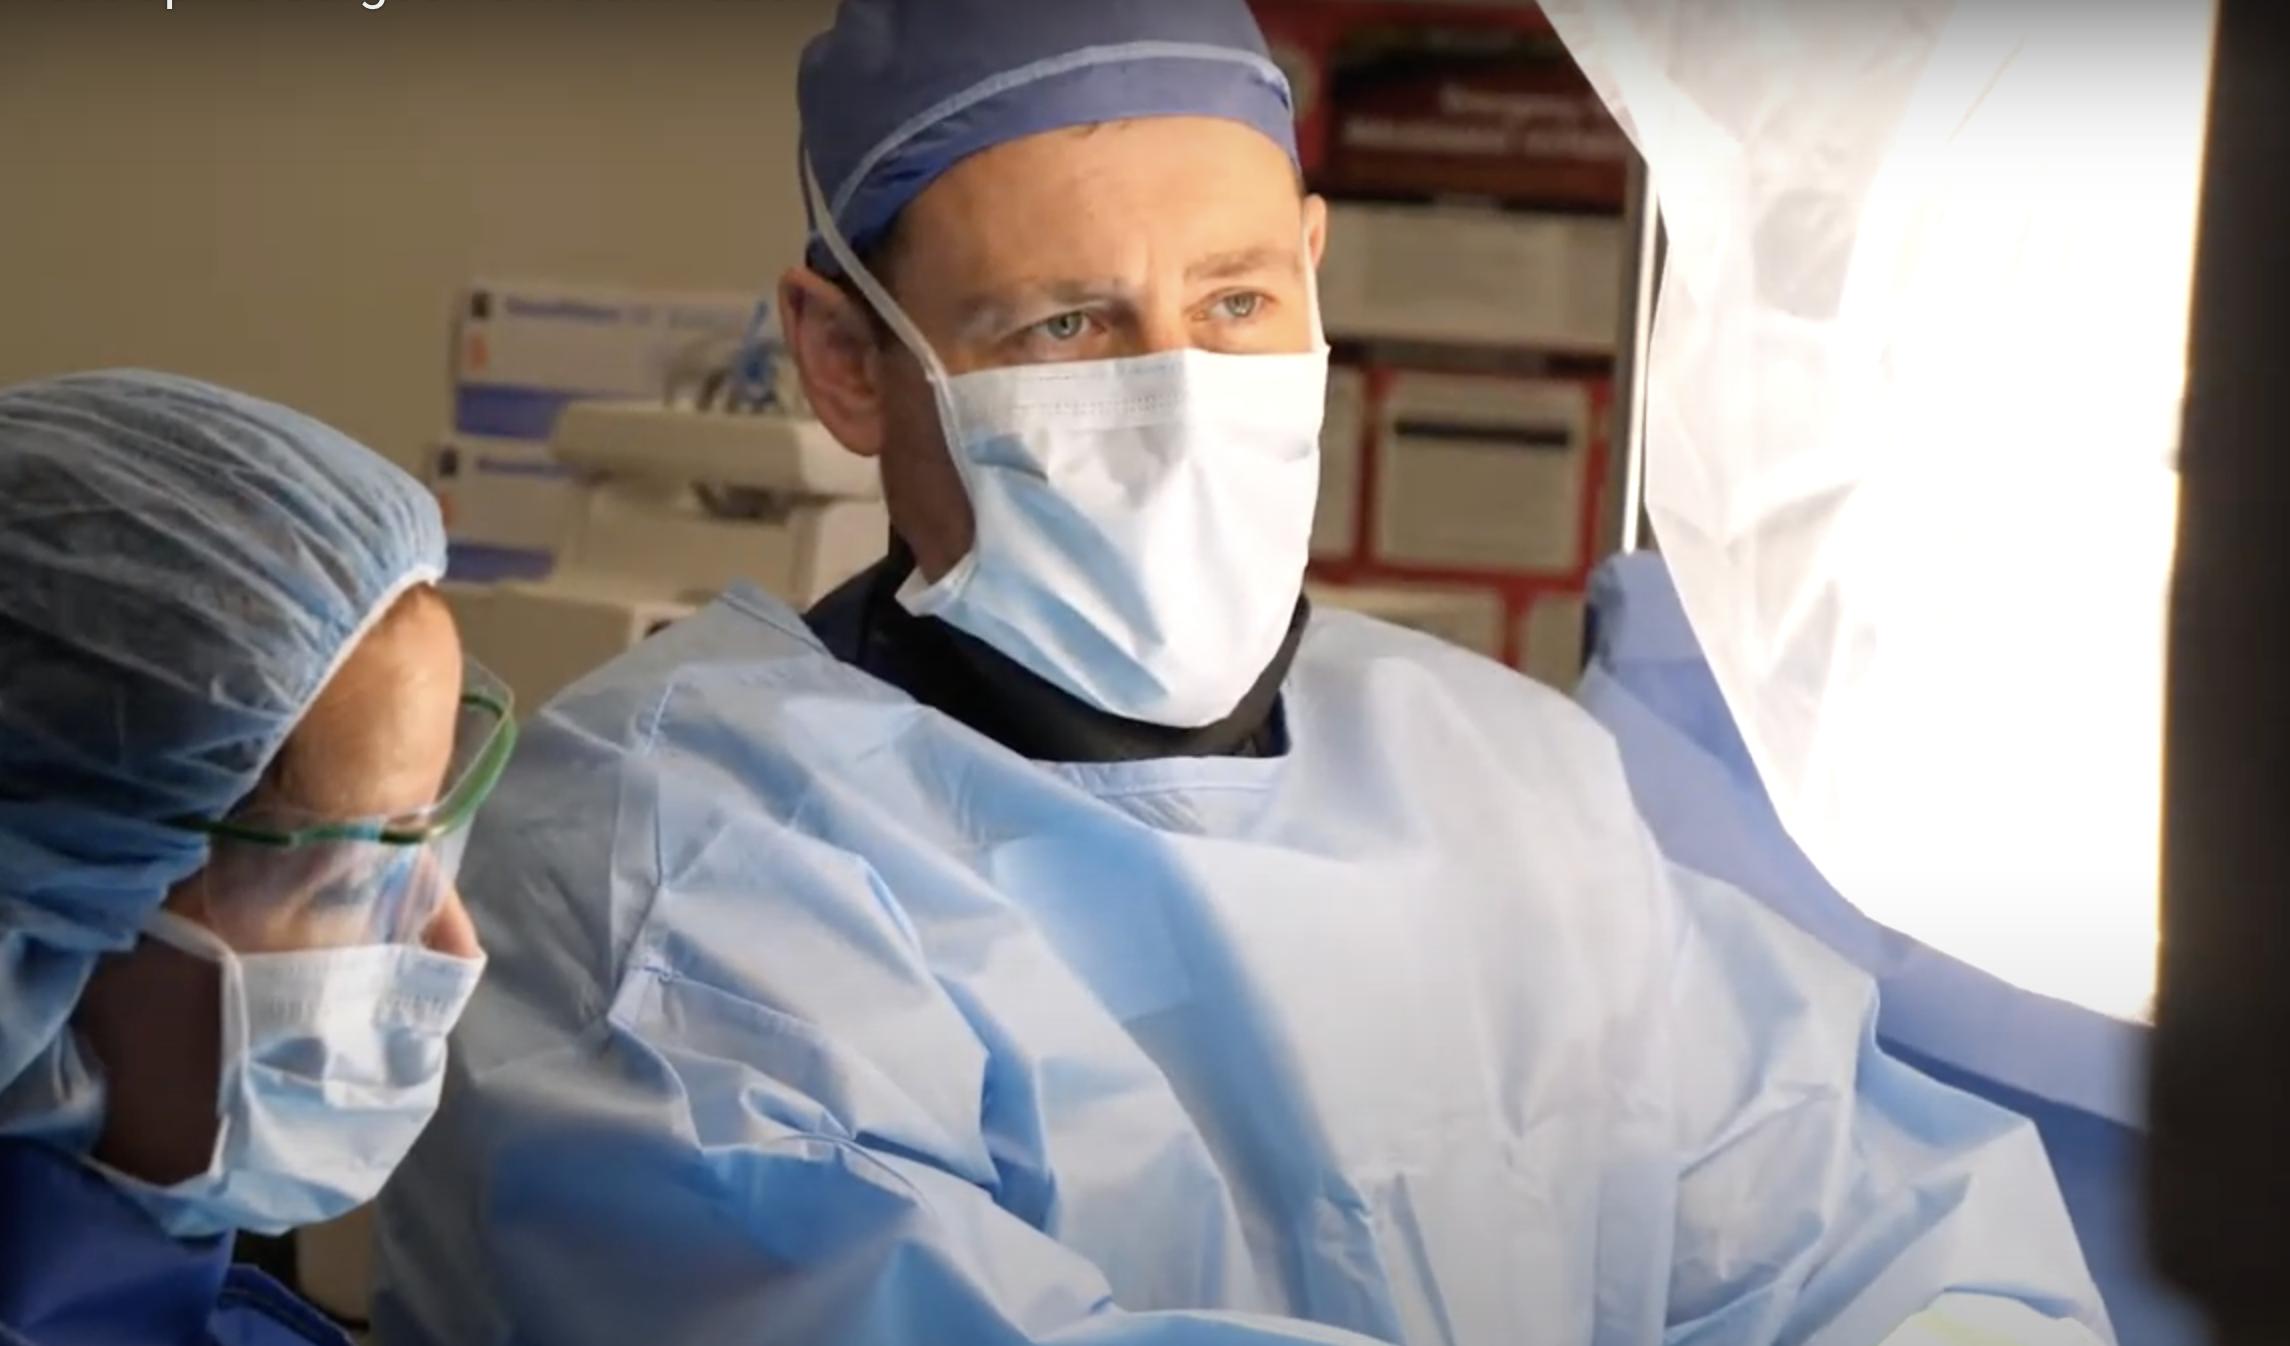 University Orthopedics' Dr. Czerwein performs revolutionary robotic spine surgery